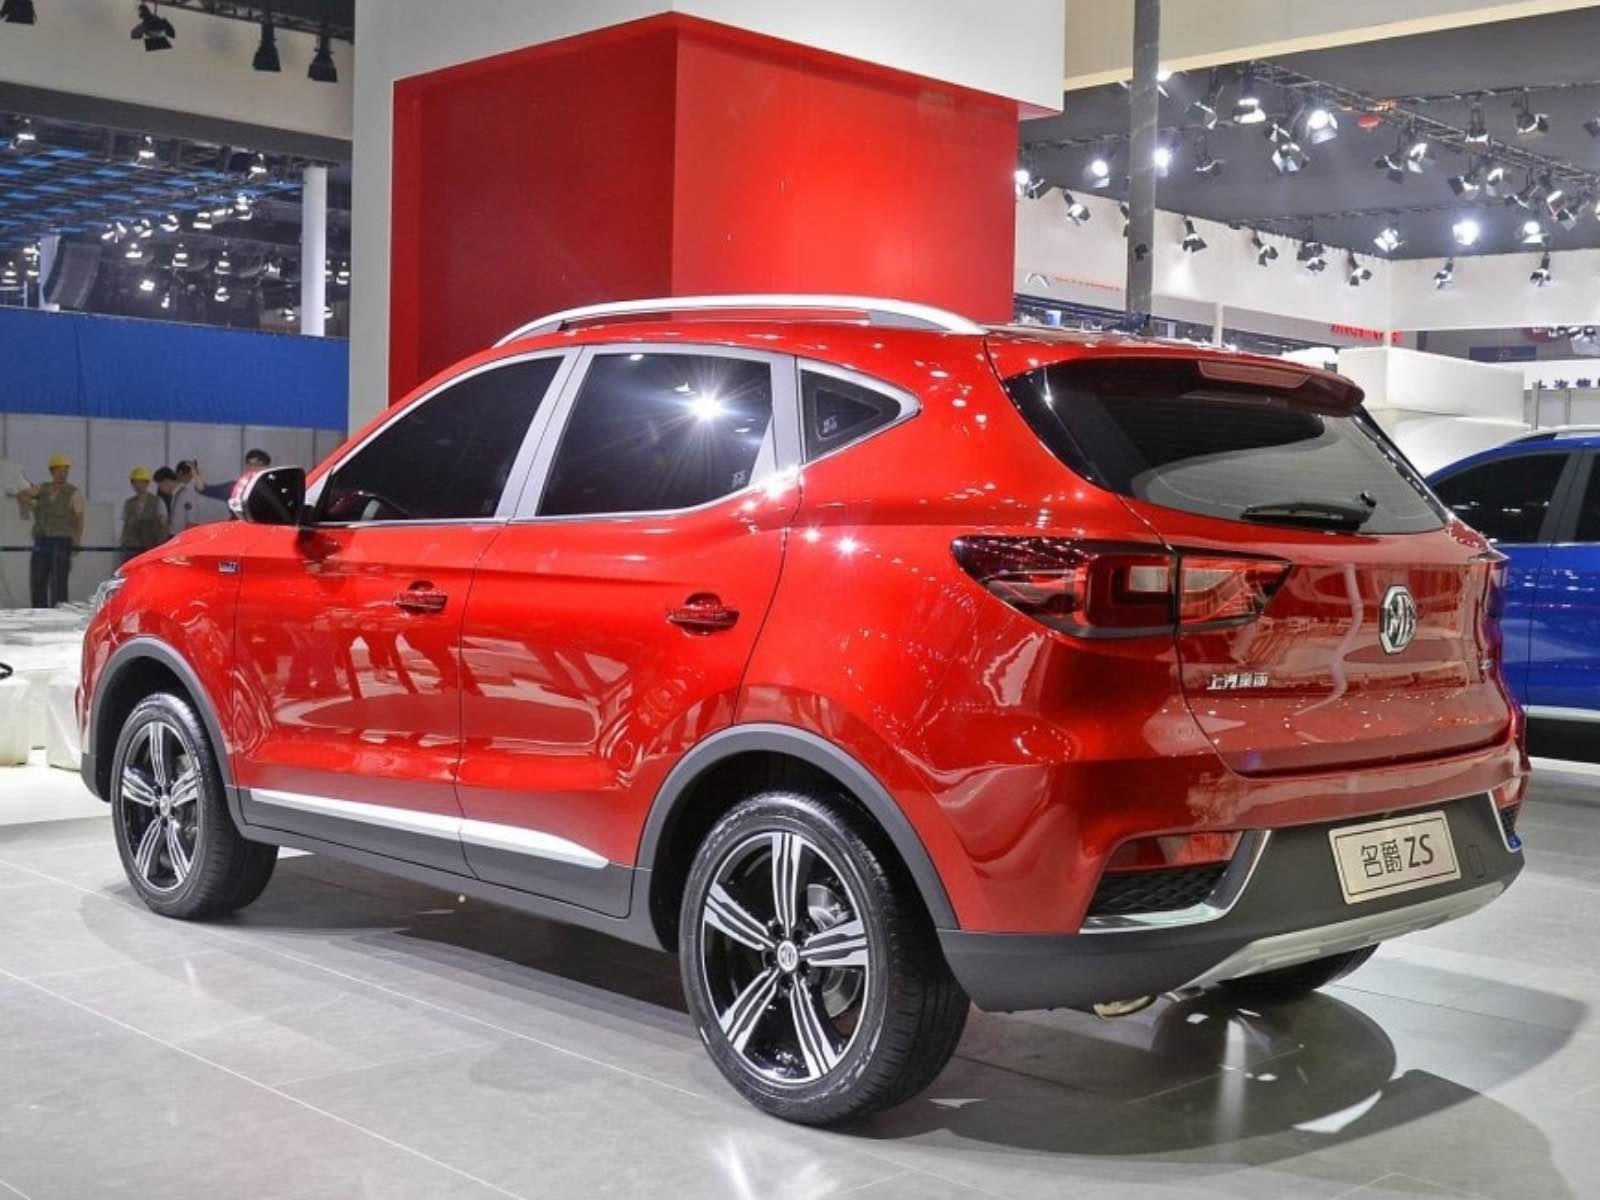 Mg zs 2018 se presenta en china for 1 costo del garage